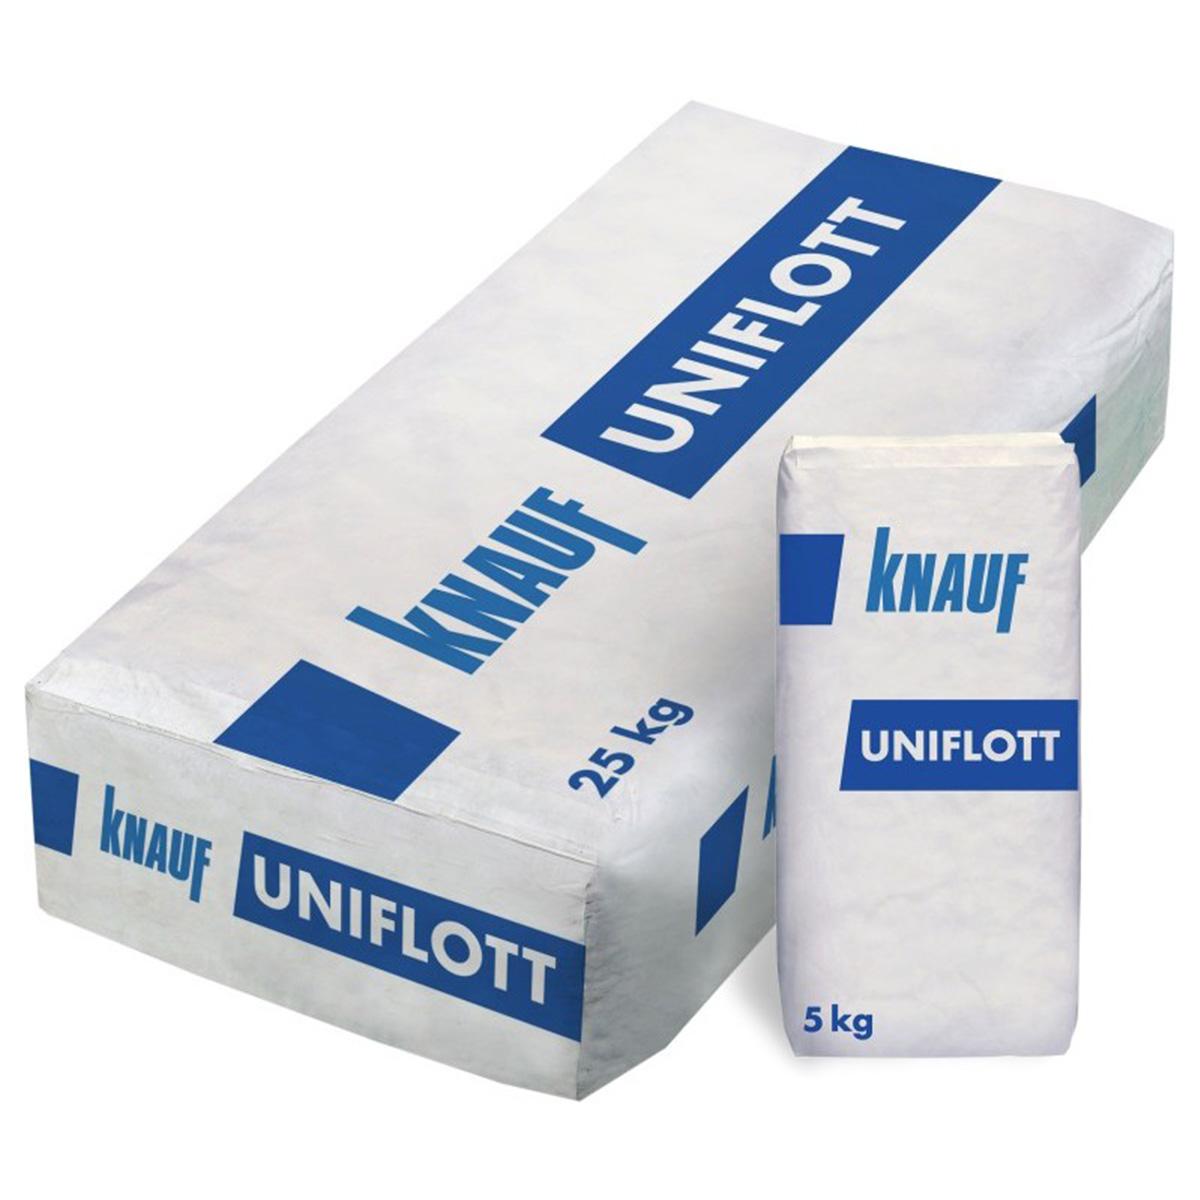 KNAUF Uniflott